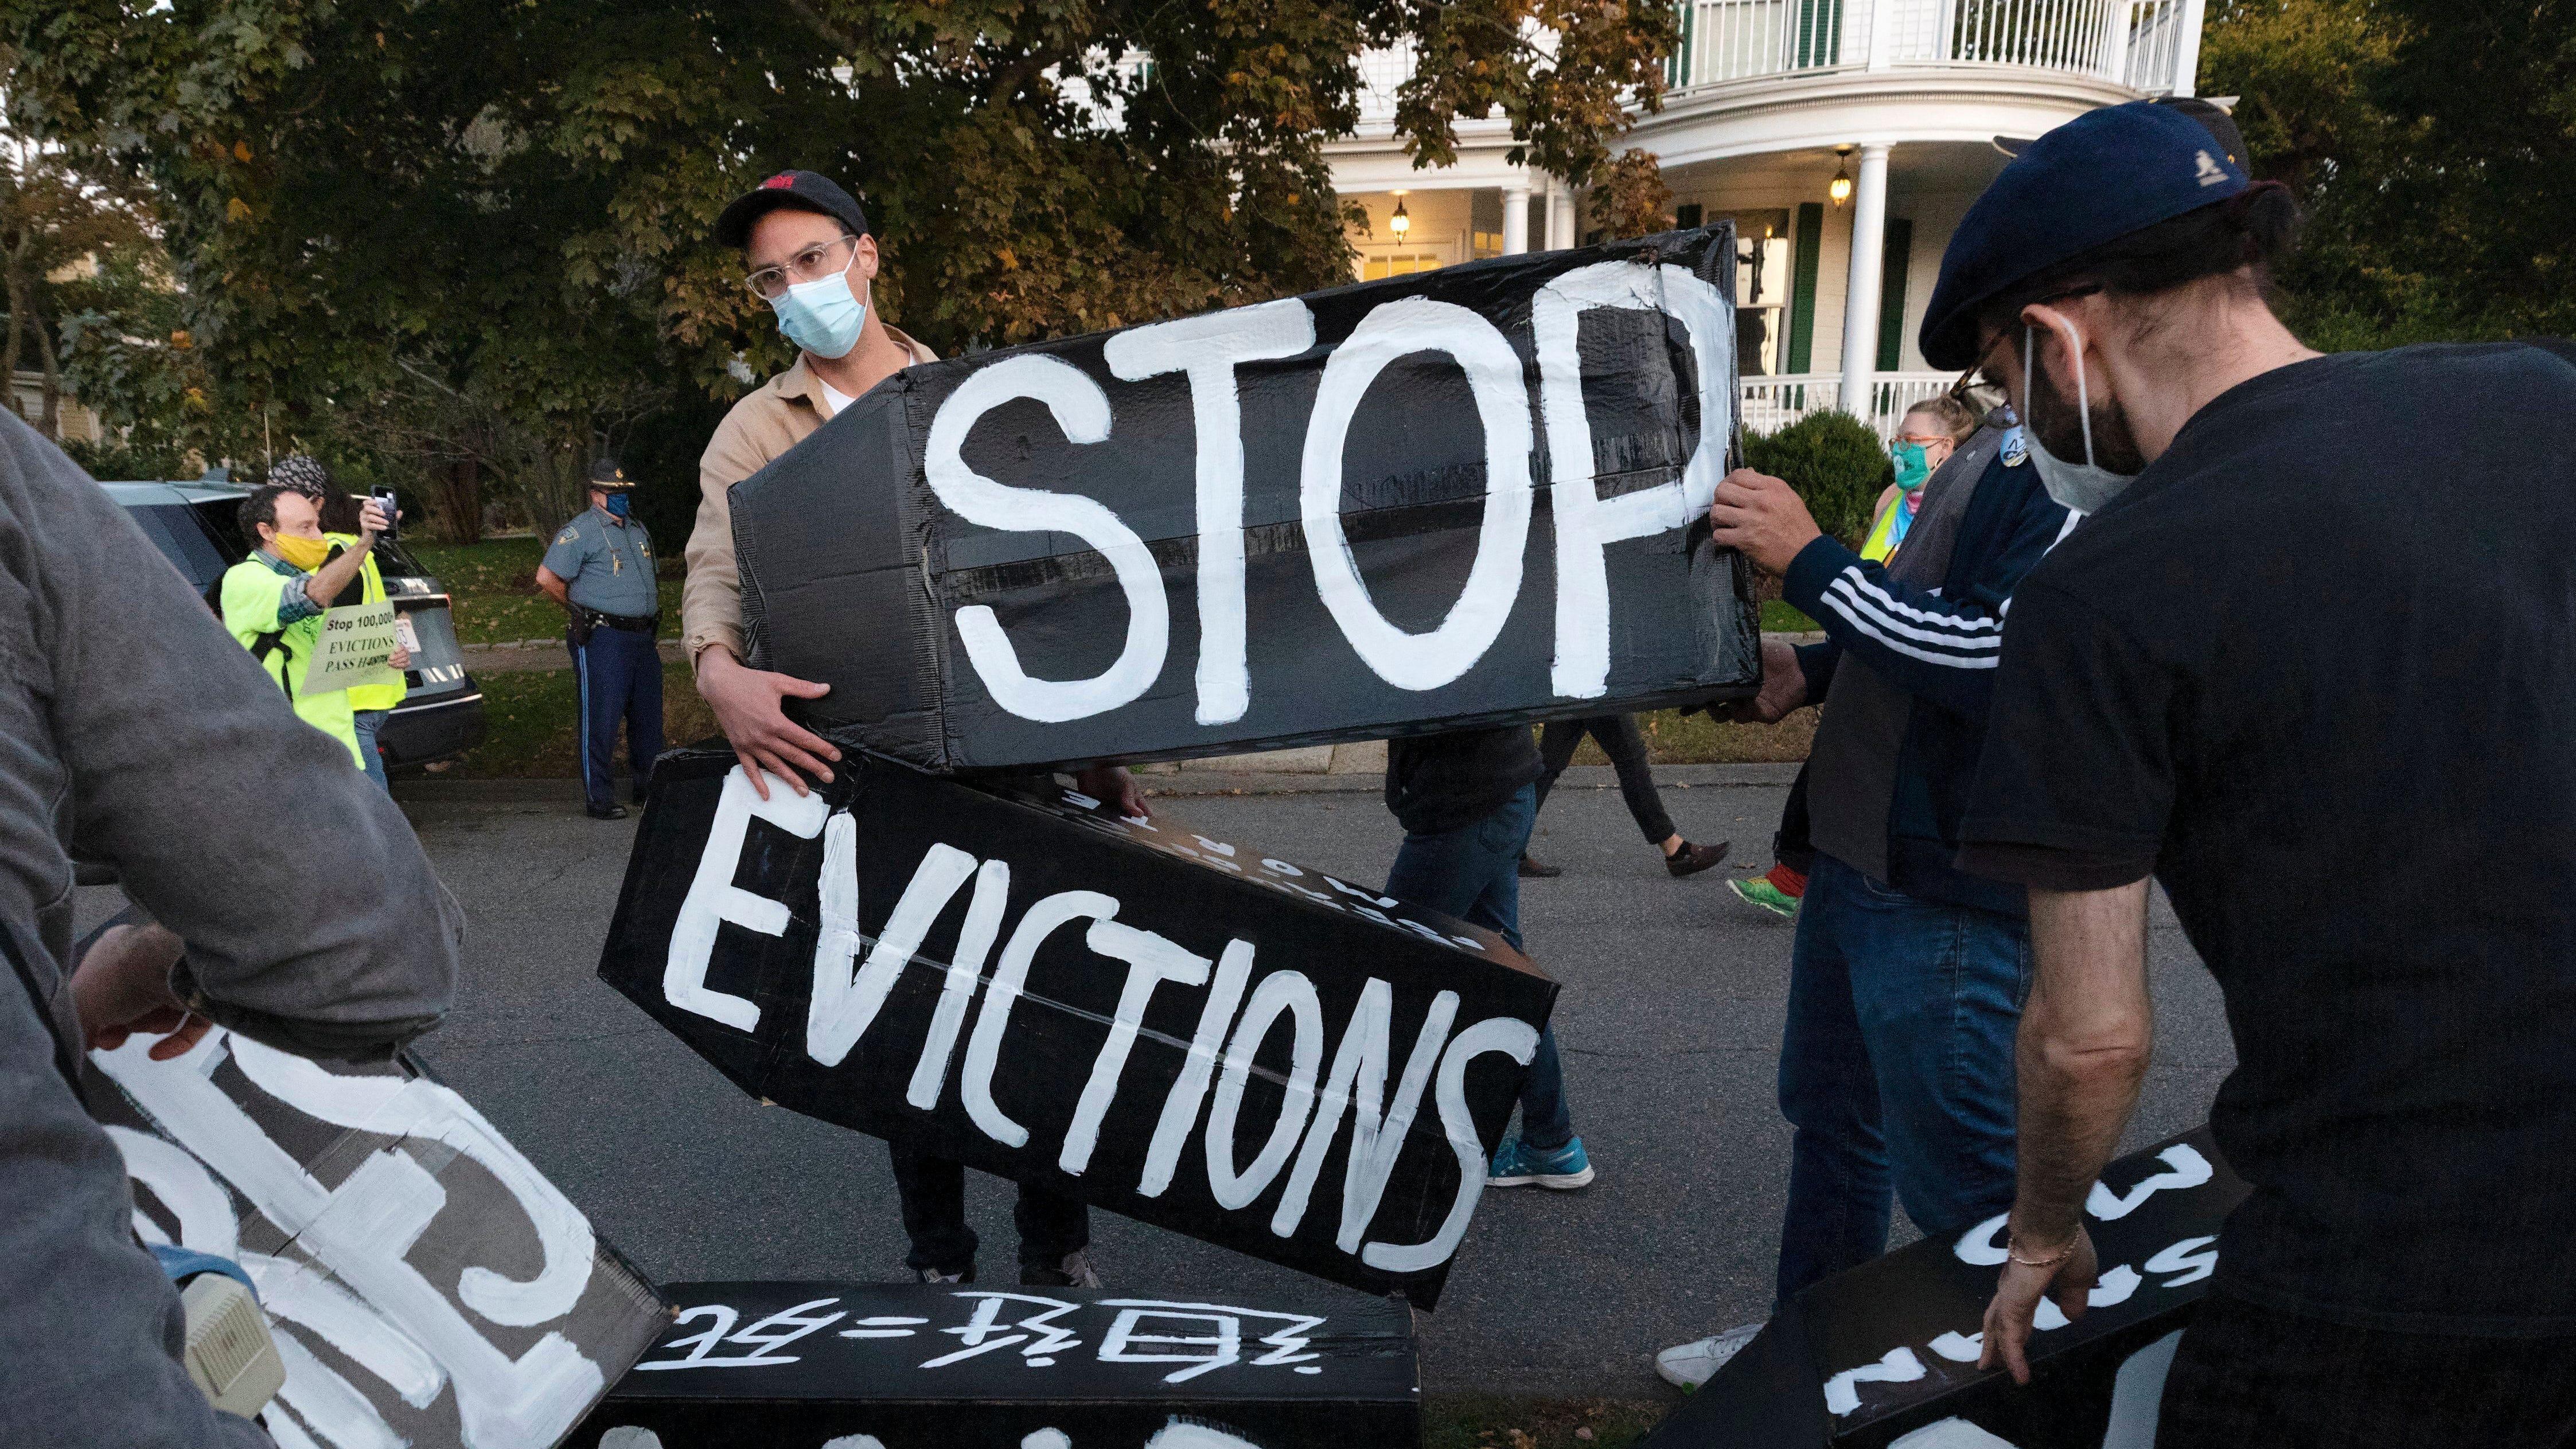 In Delaware, few tenants get evicted